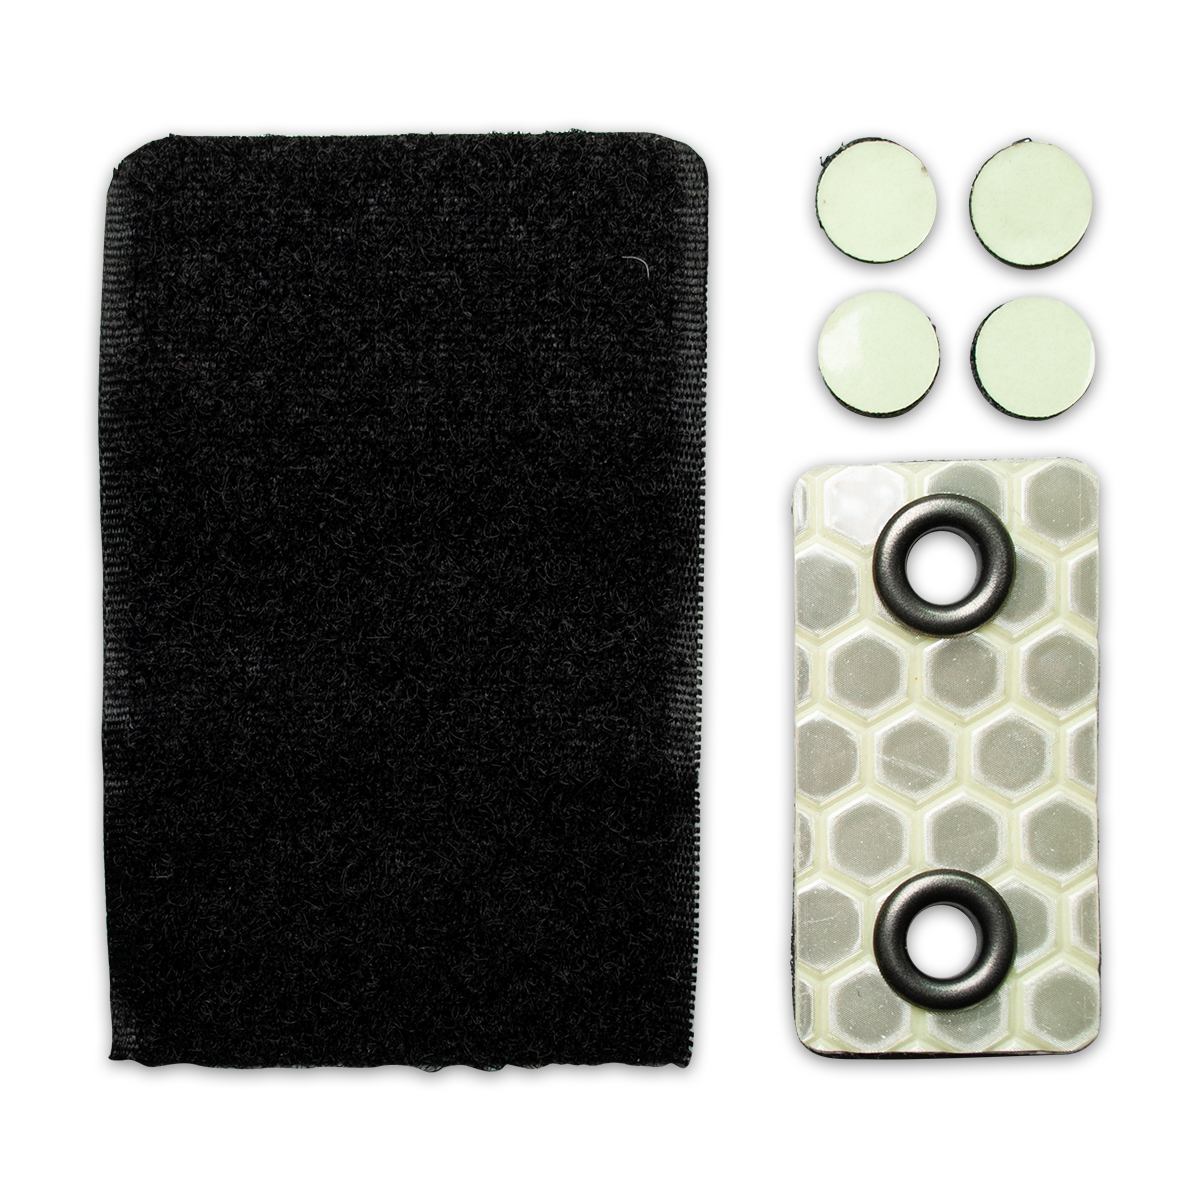 Ru-Marker Wrap Kit